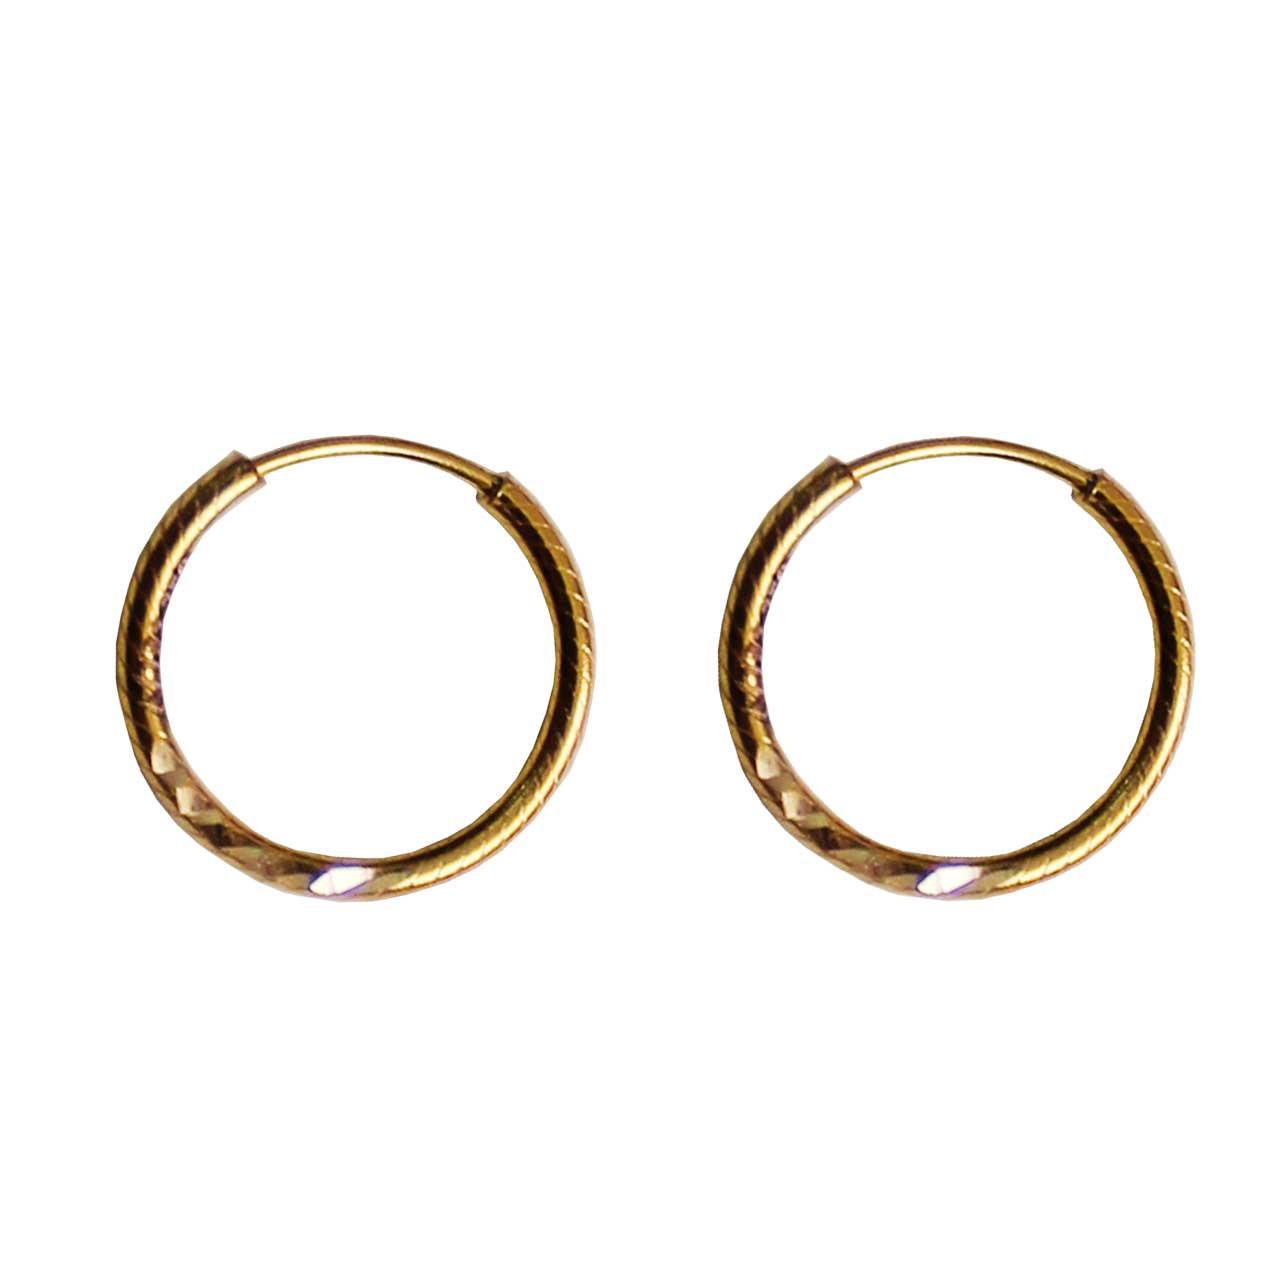 قیمت گوشواره طلا 18 عیار نازنین کد A501